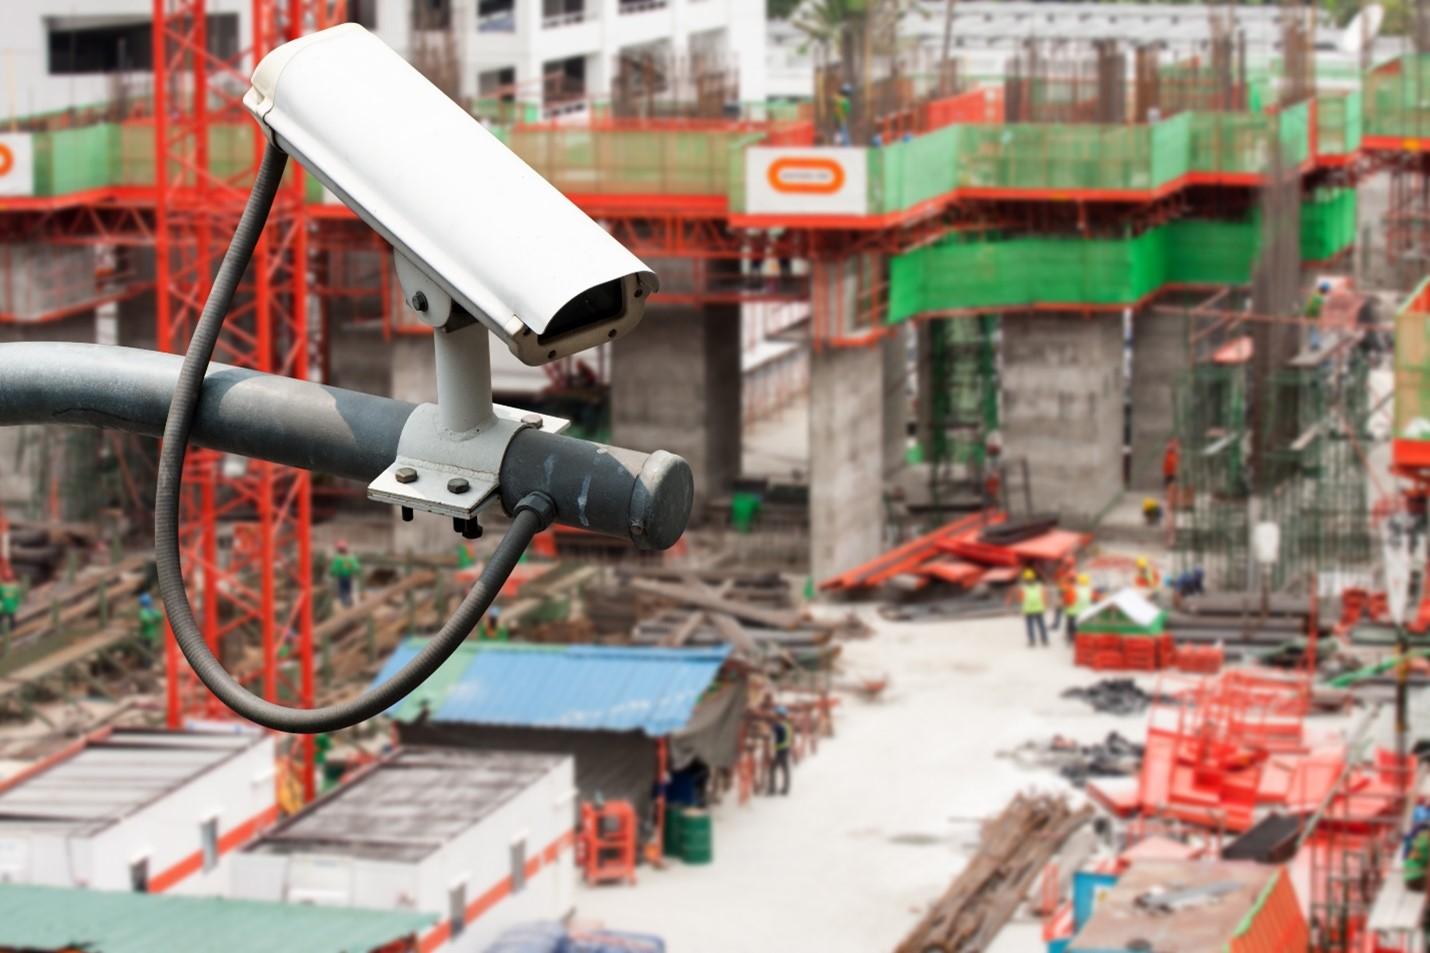 constructionsite-cctv-security-camera